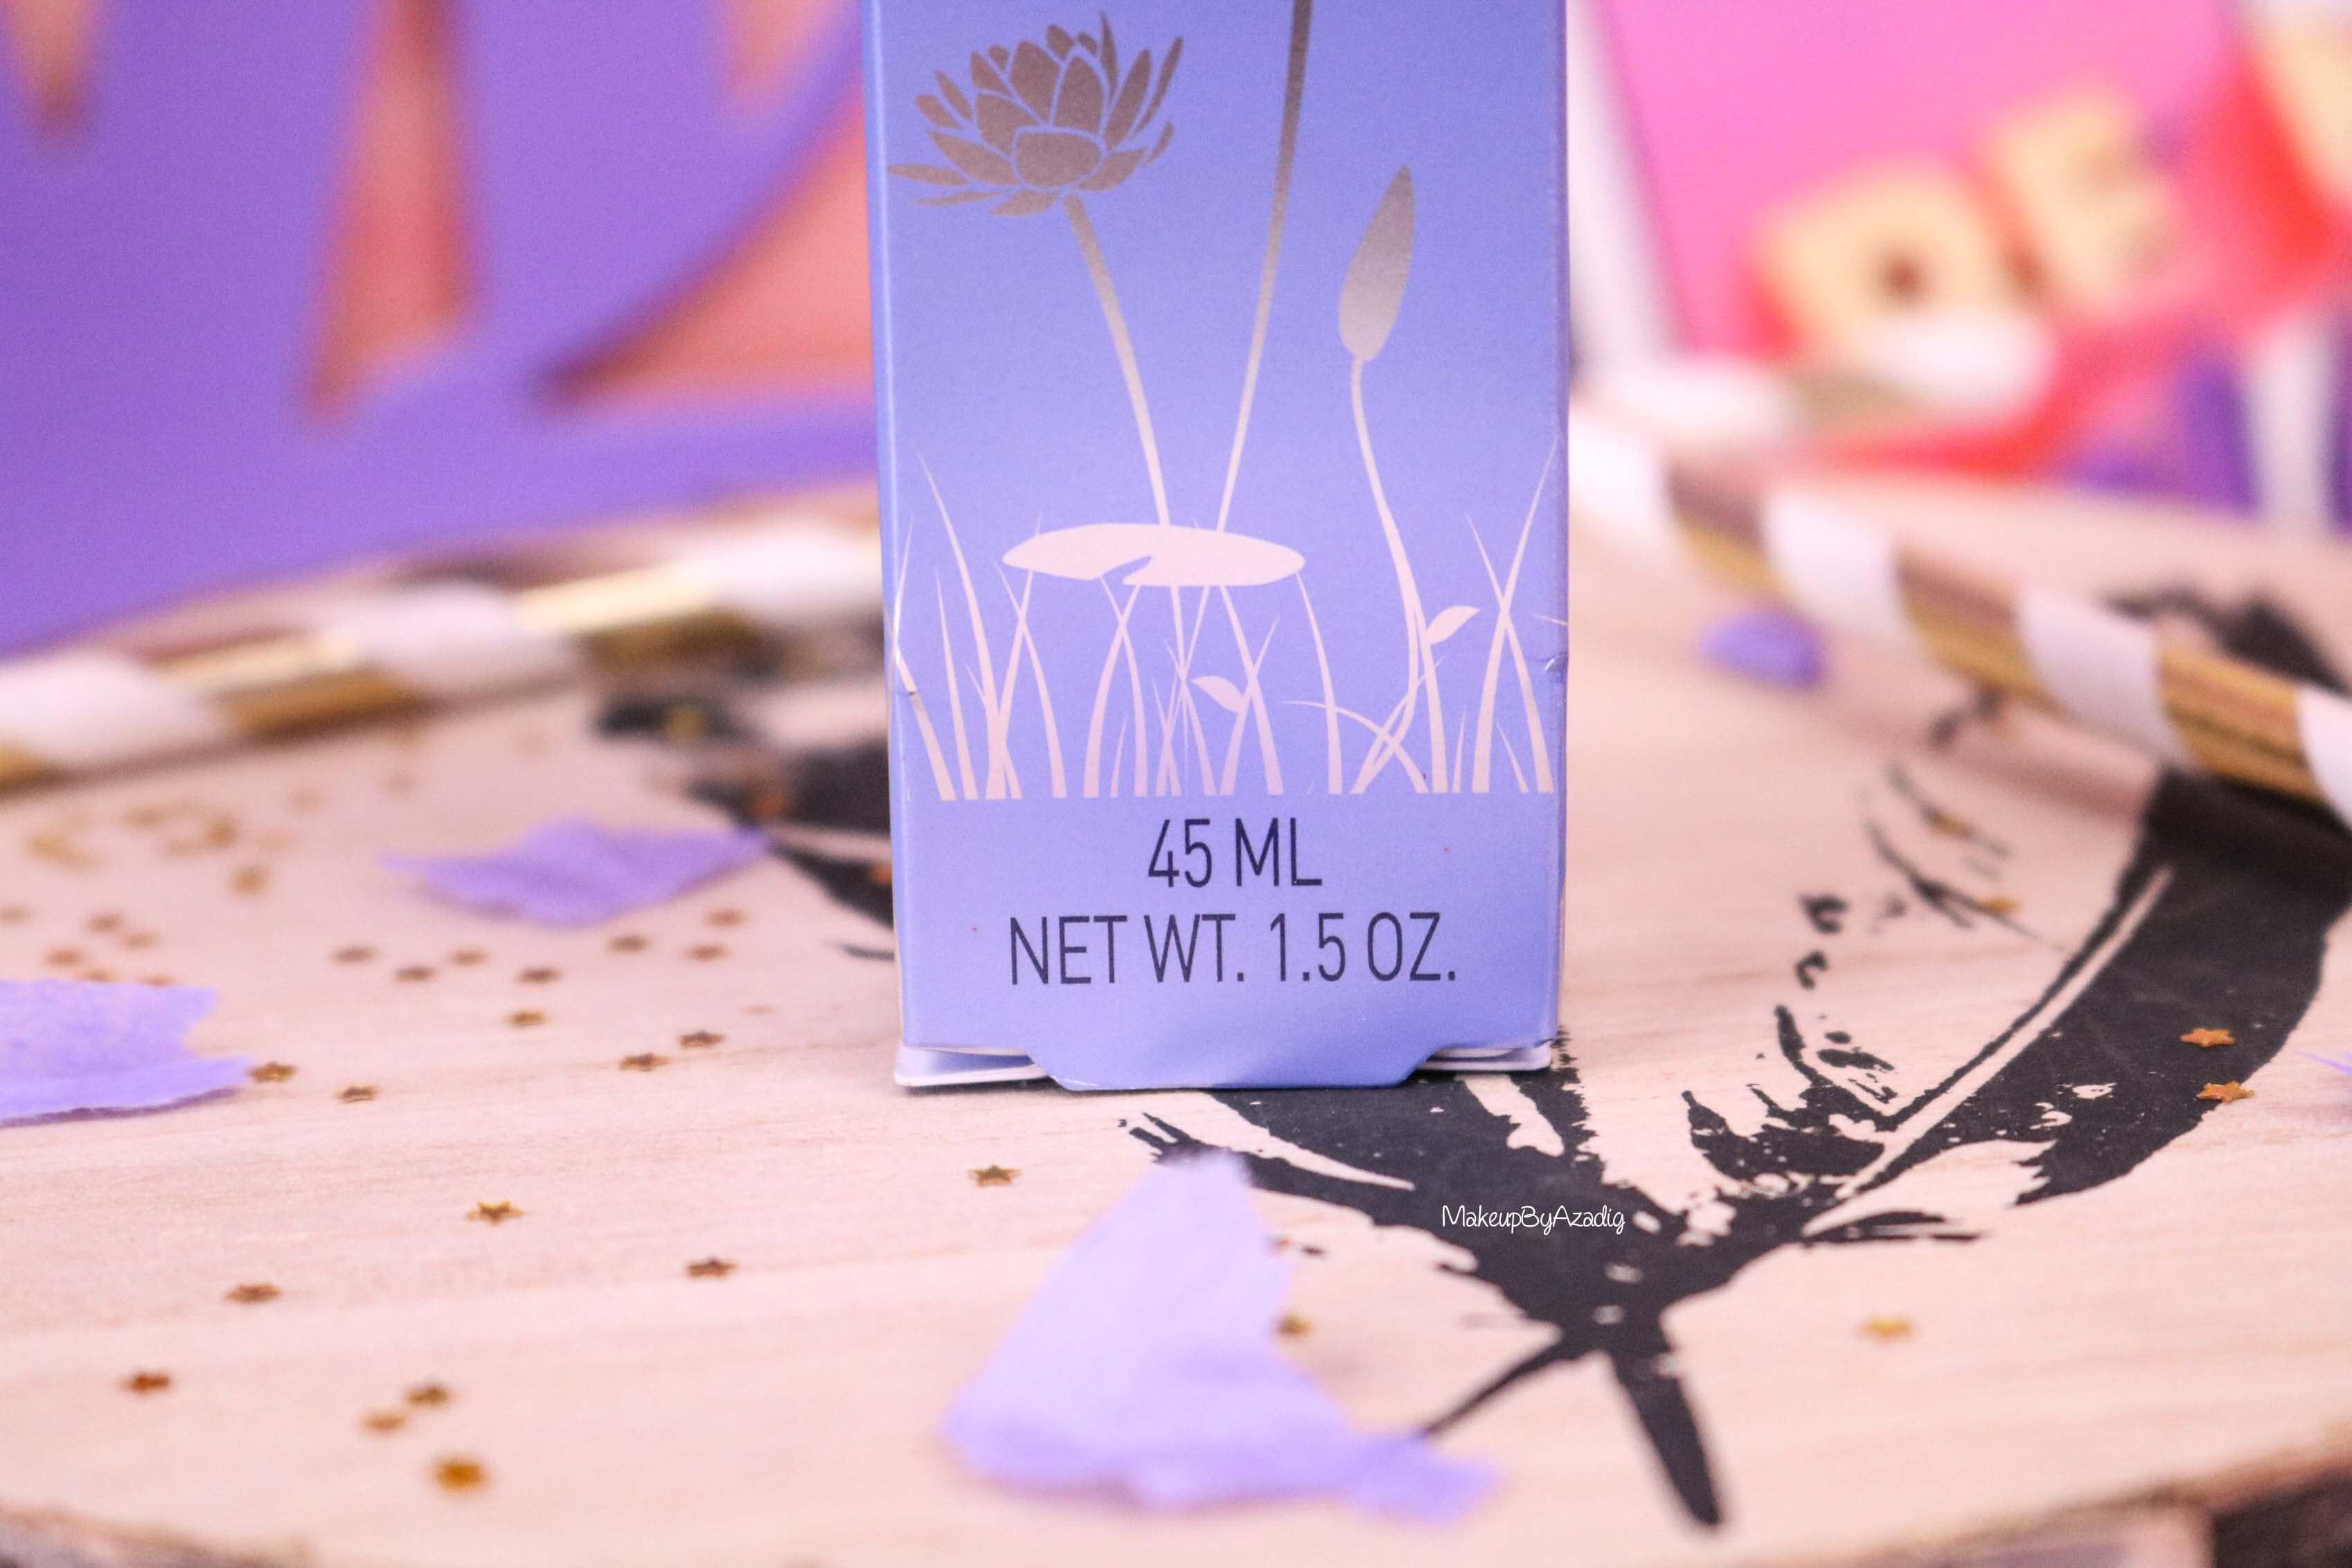 revue-matte-creme-matifiant-floute-erborian-prix-avis-makeupbyazadig-nouveaute-sephora-quantite